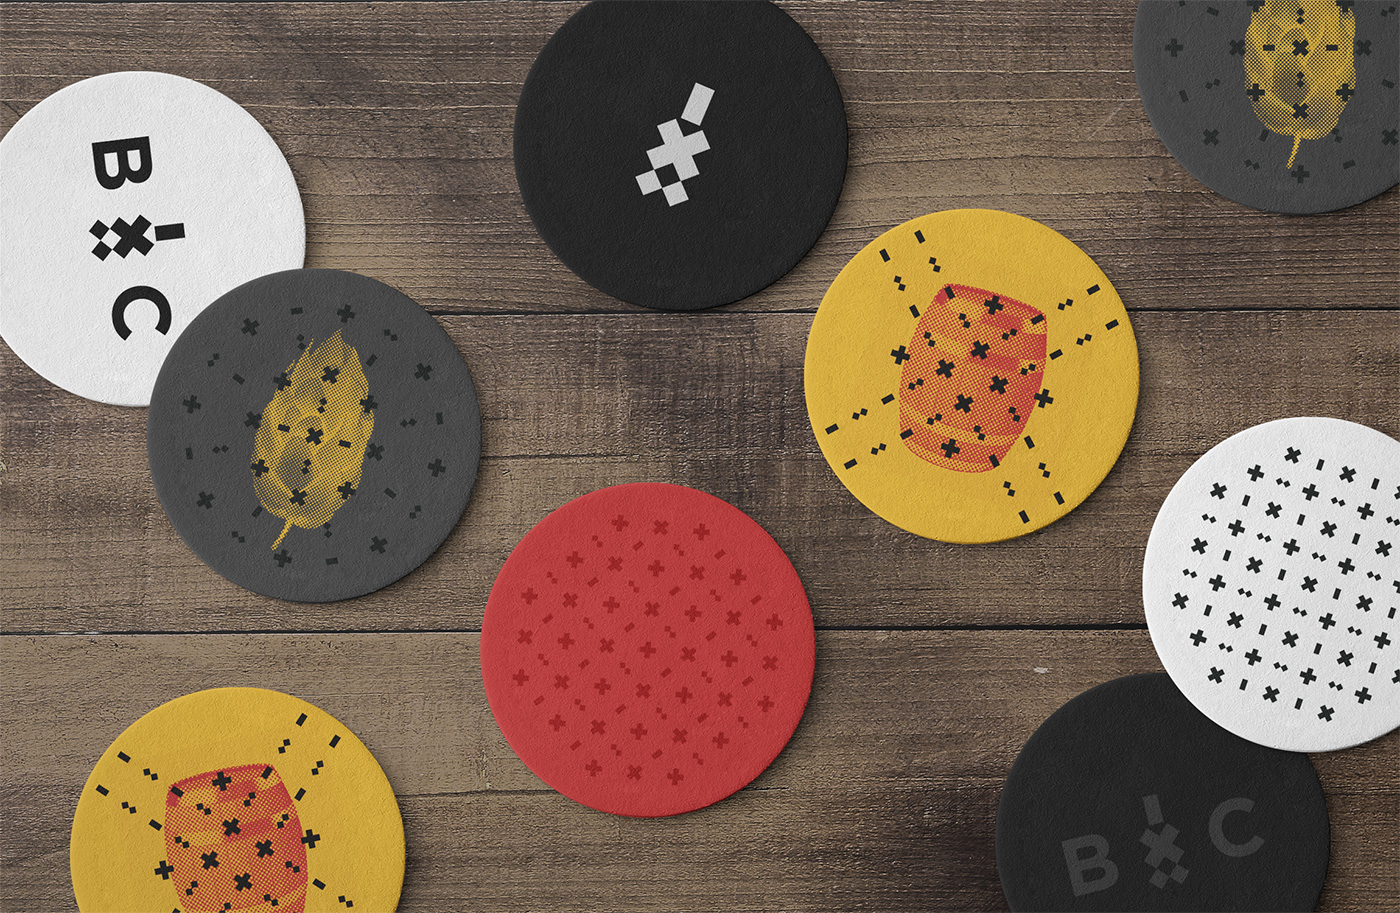 Birre_coasters.jpg